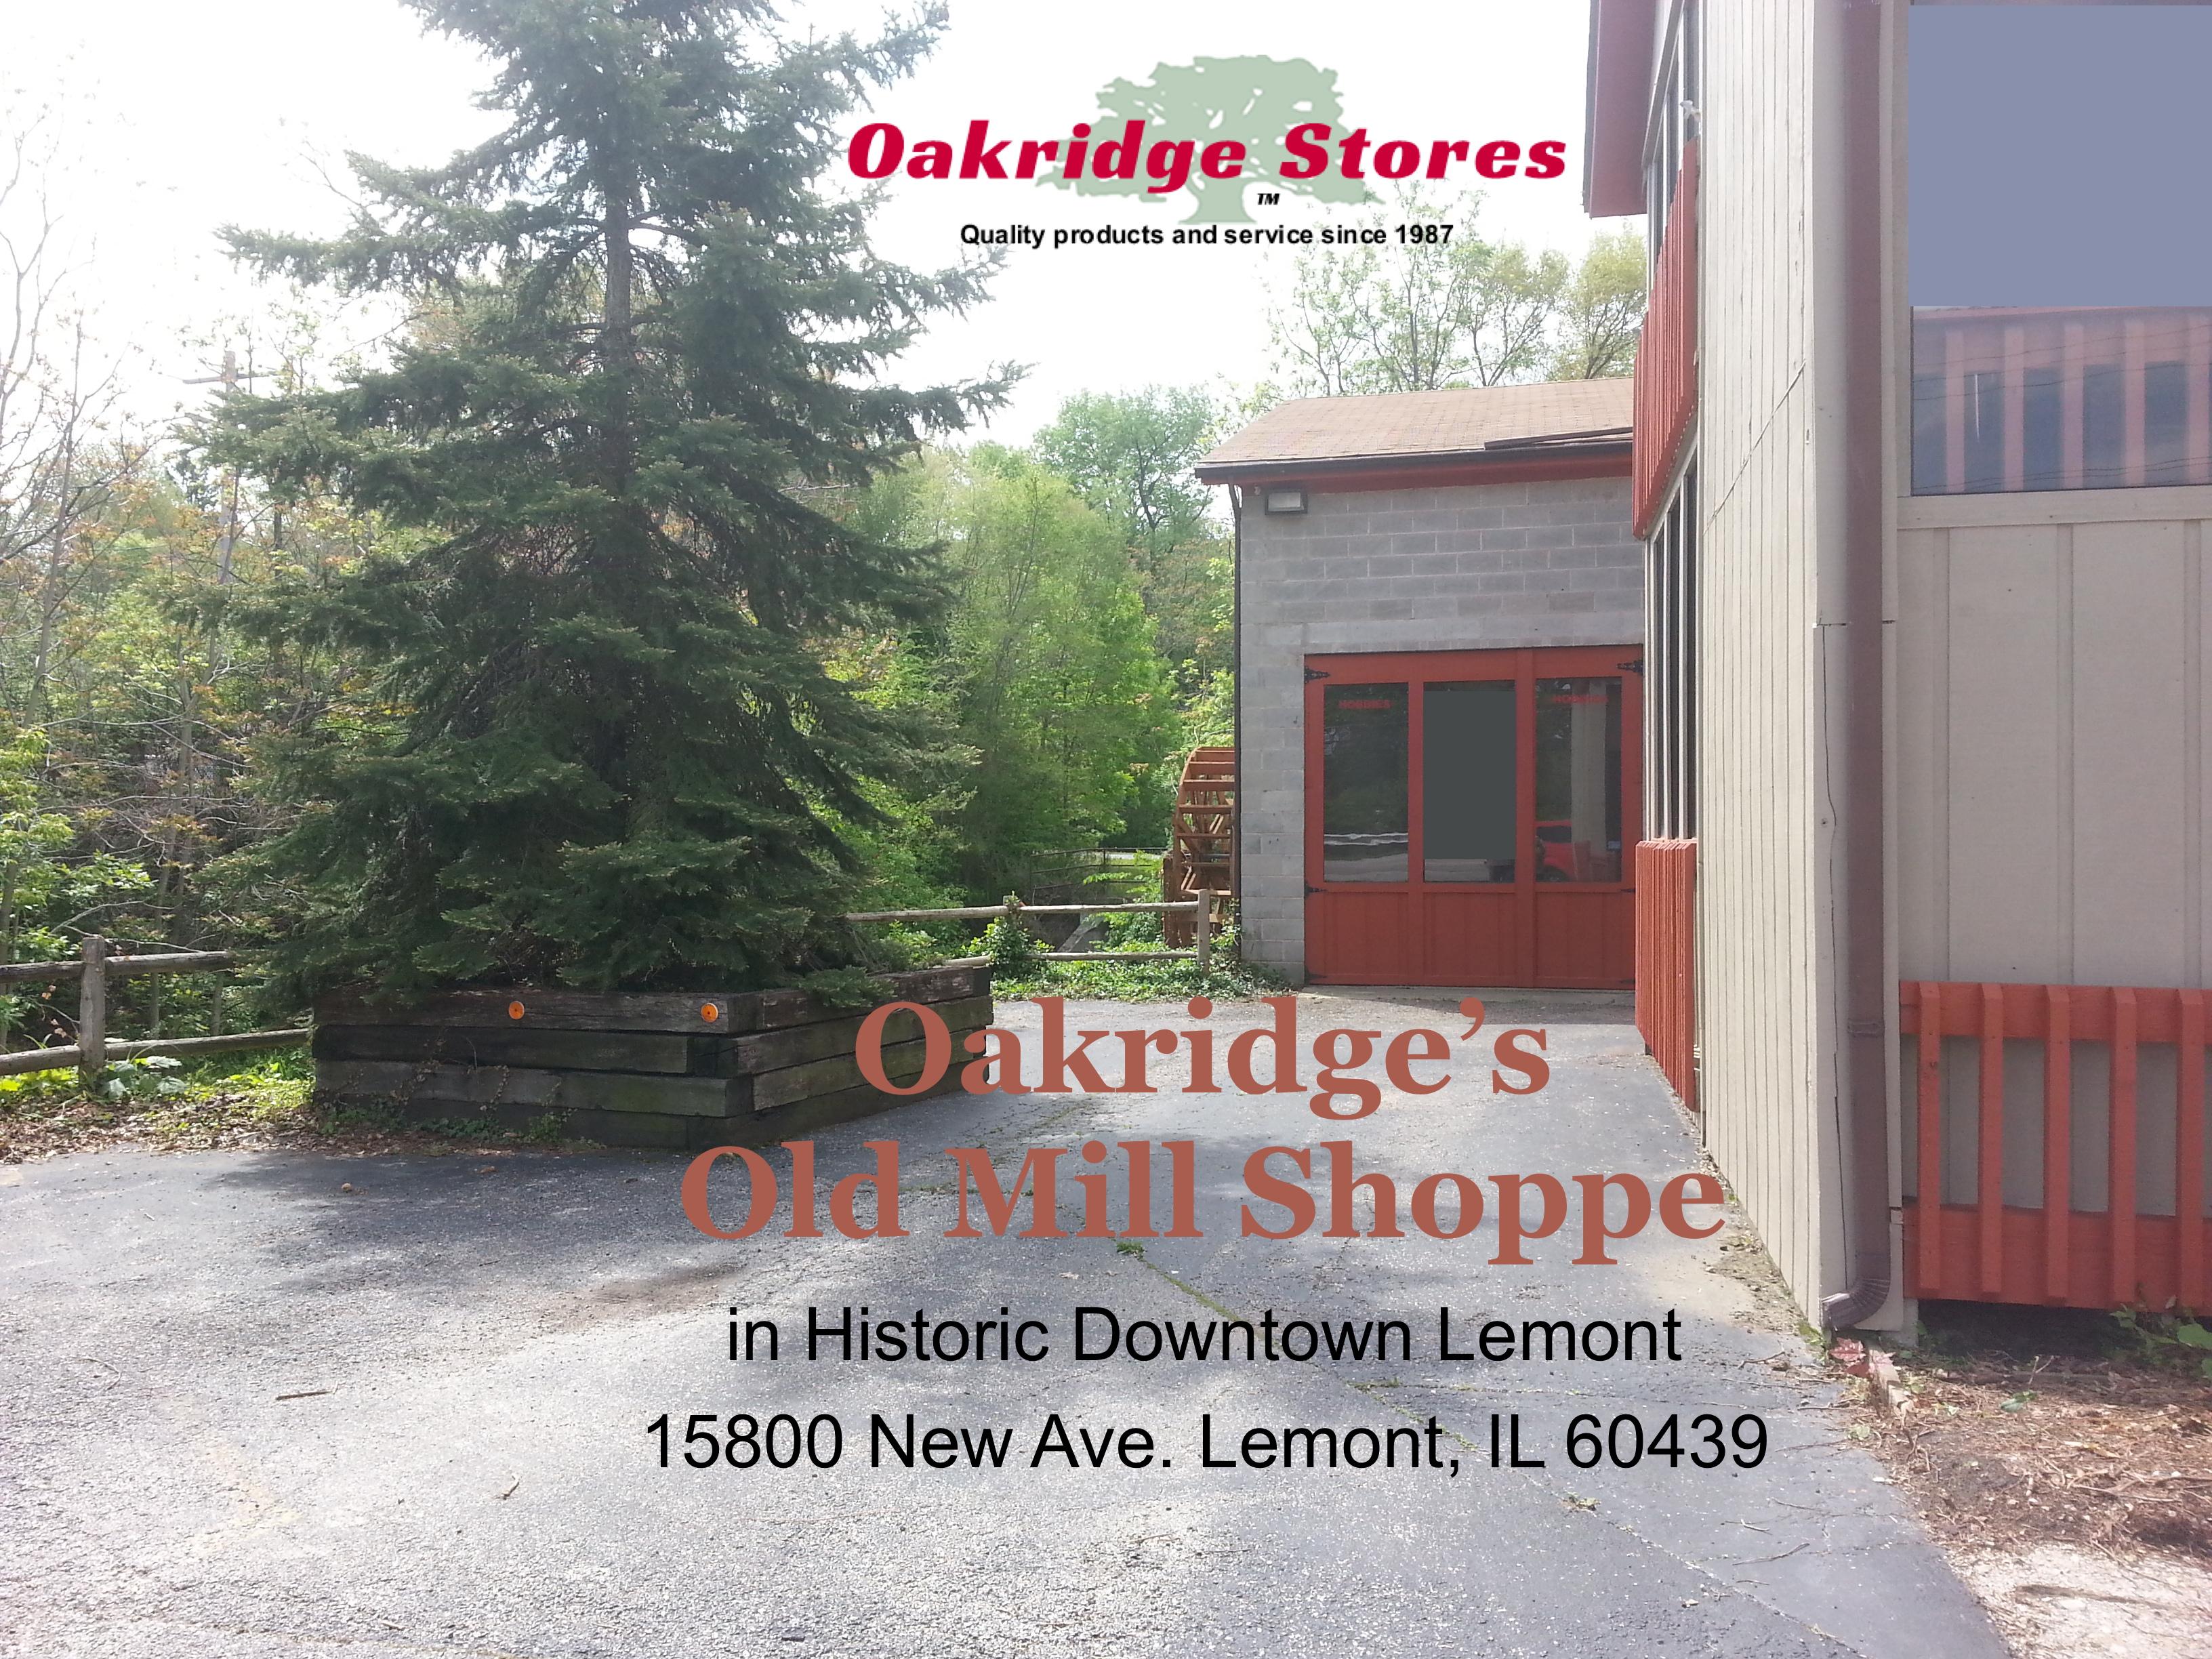 Oakridge's Old Mill Shoppe - Oakridge Hobbies & Toys - OakridgeStores in Lemont IL